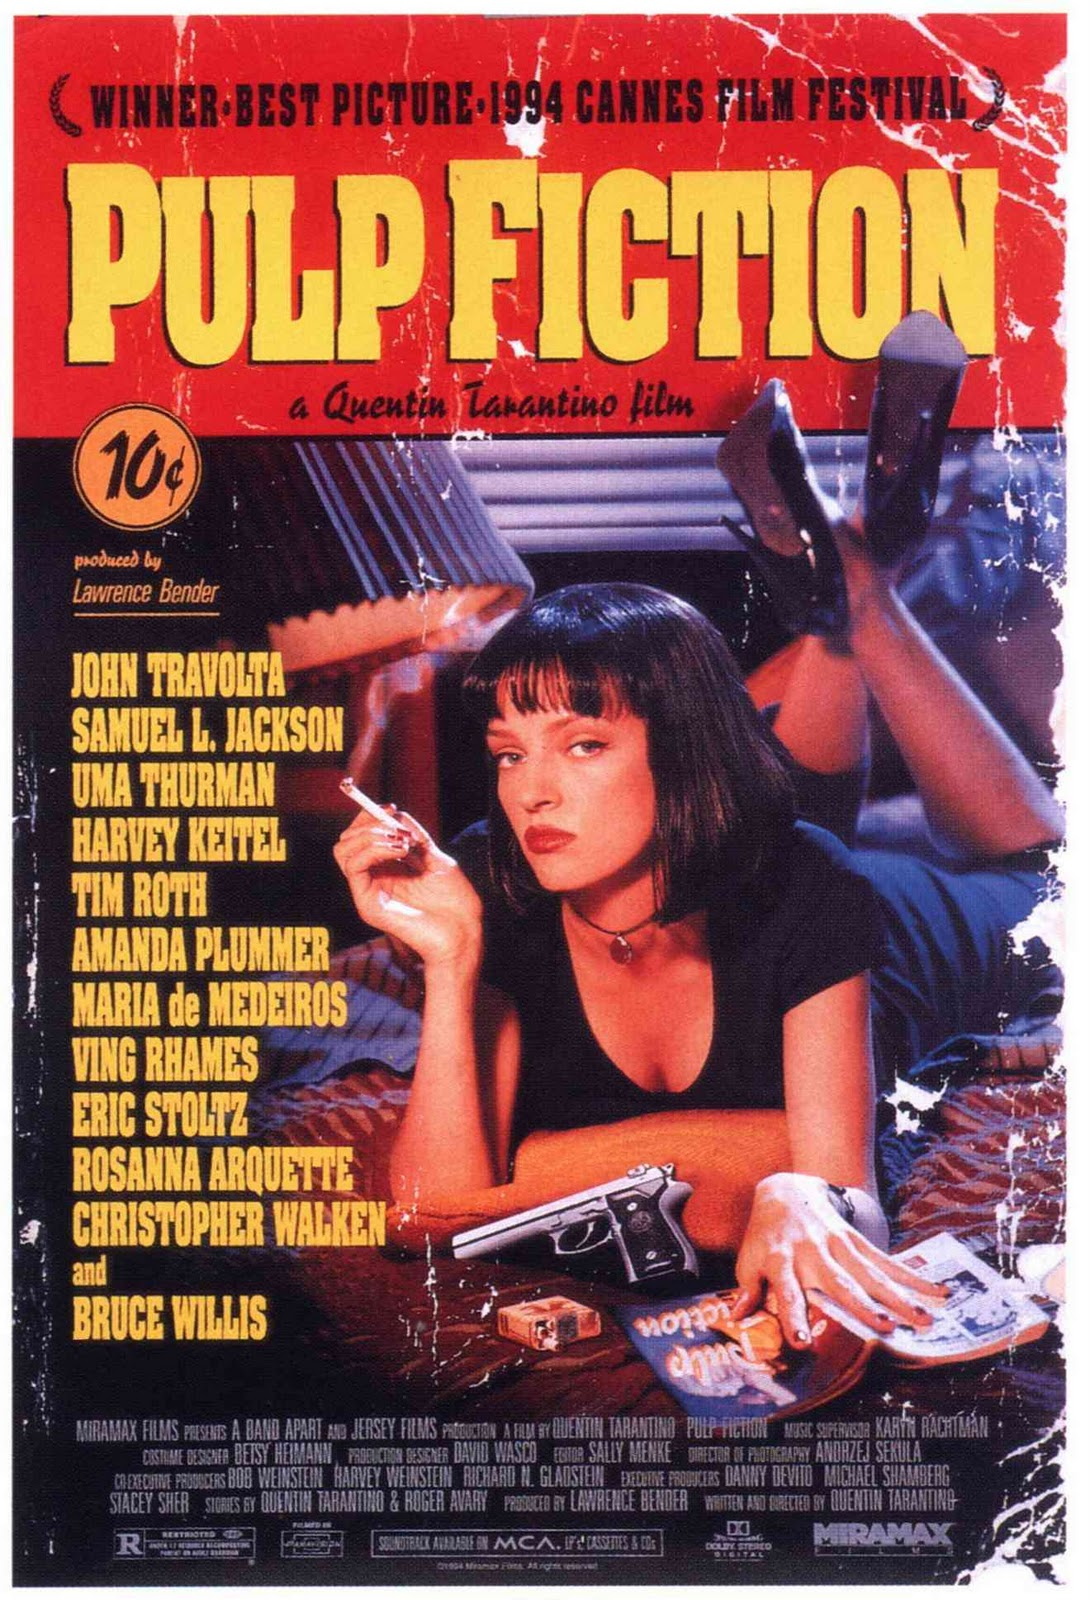 http://3.bp.blogspot.com/_qJvWmH3byPE/TSso9JI-khI/AAAAAAAAABI/Rr_e4y3SqaY/s1600/pulp-fiction-poster-orig%255B1%255D.jpg